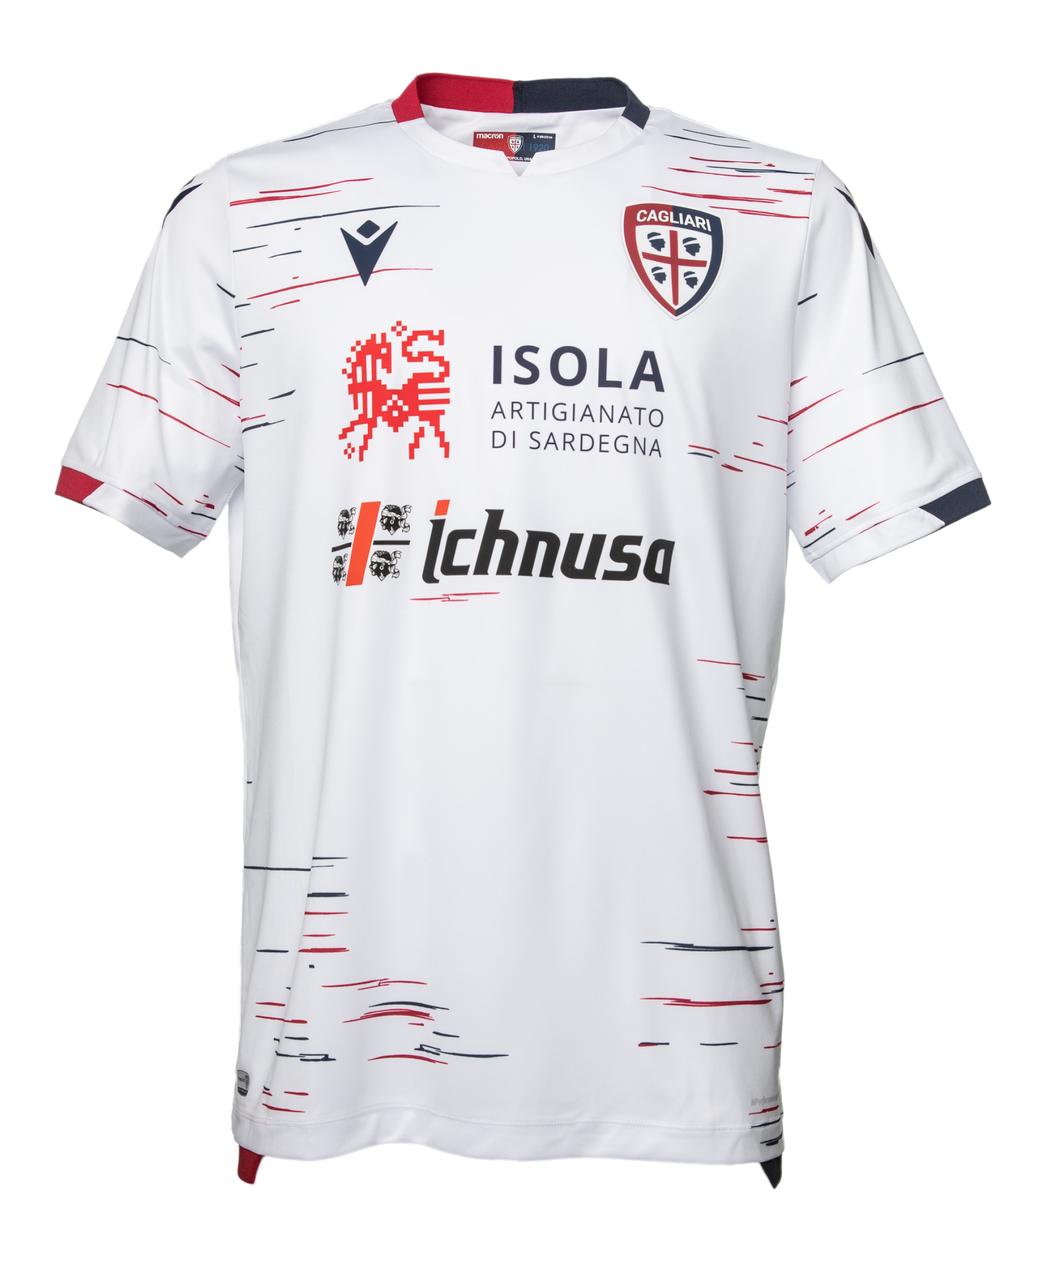 maillot-exterieur-cagliari-2019-2020-macron